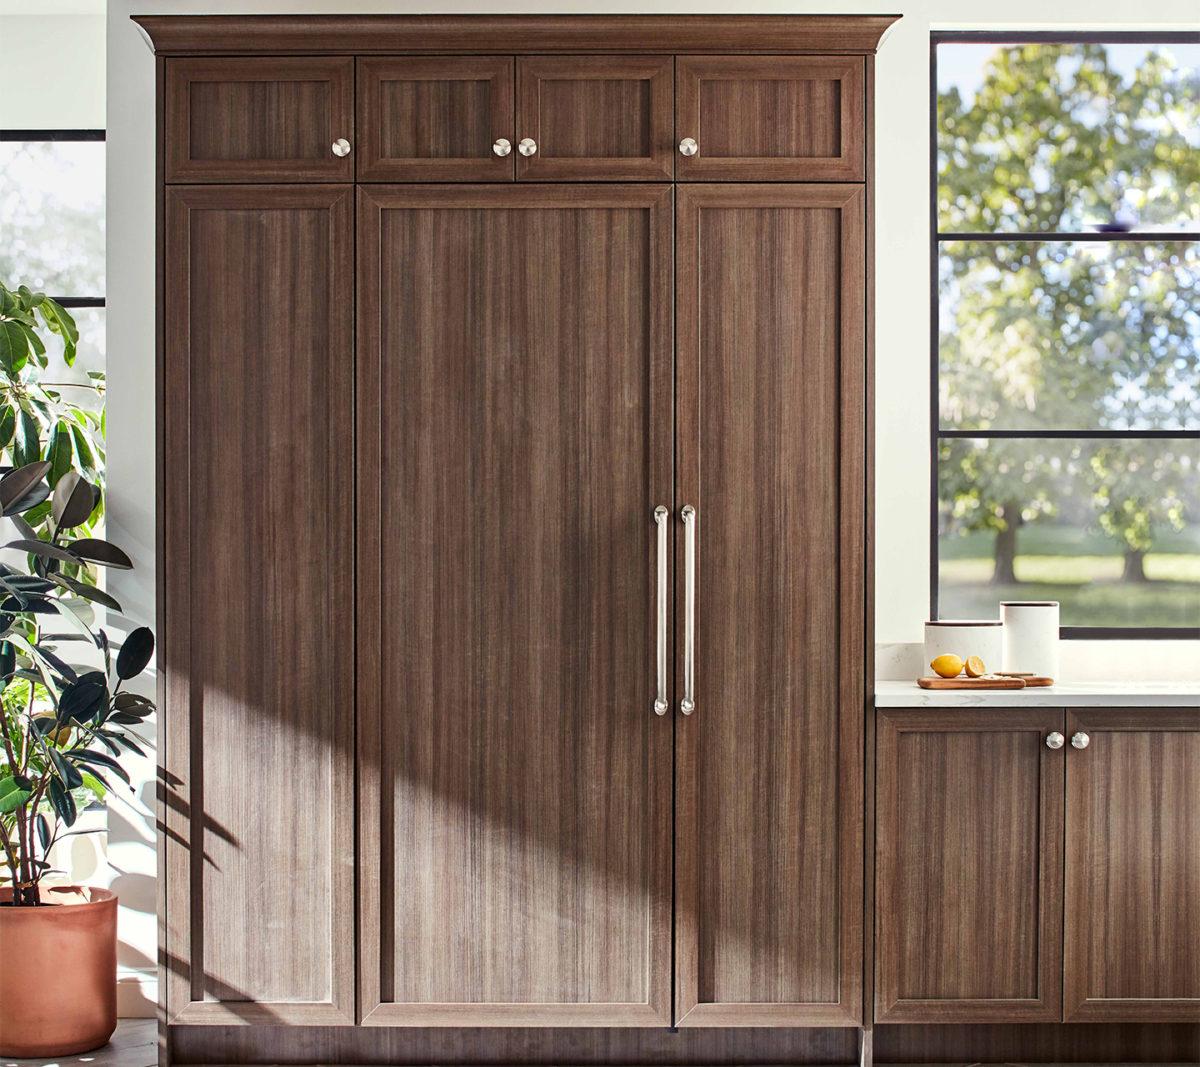 SKS Seamless built-in refrigerator